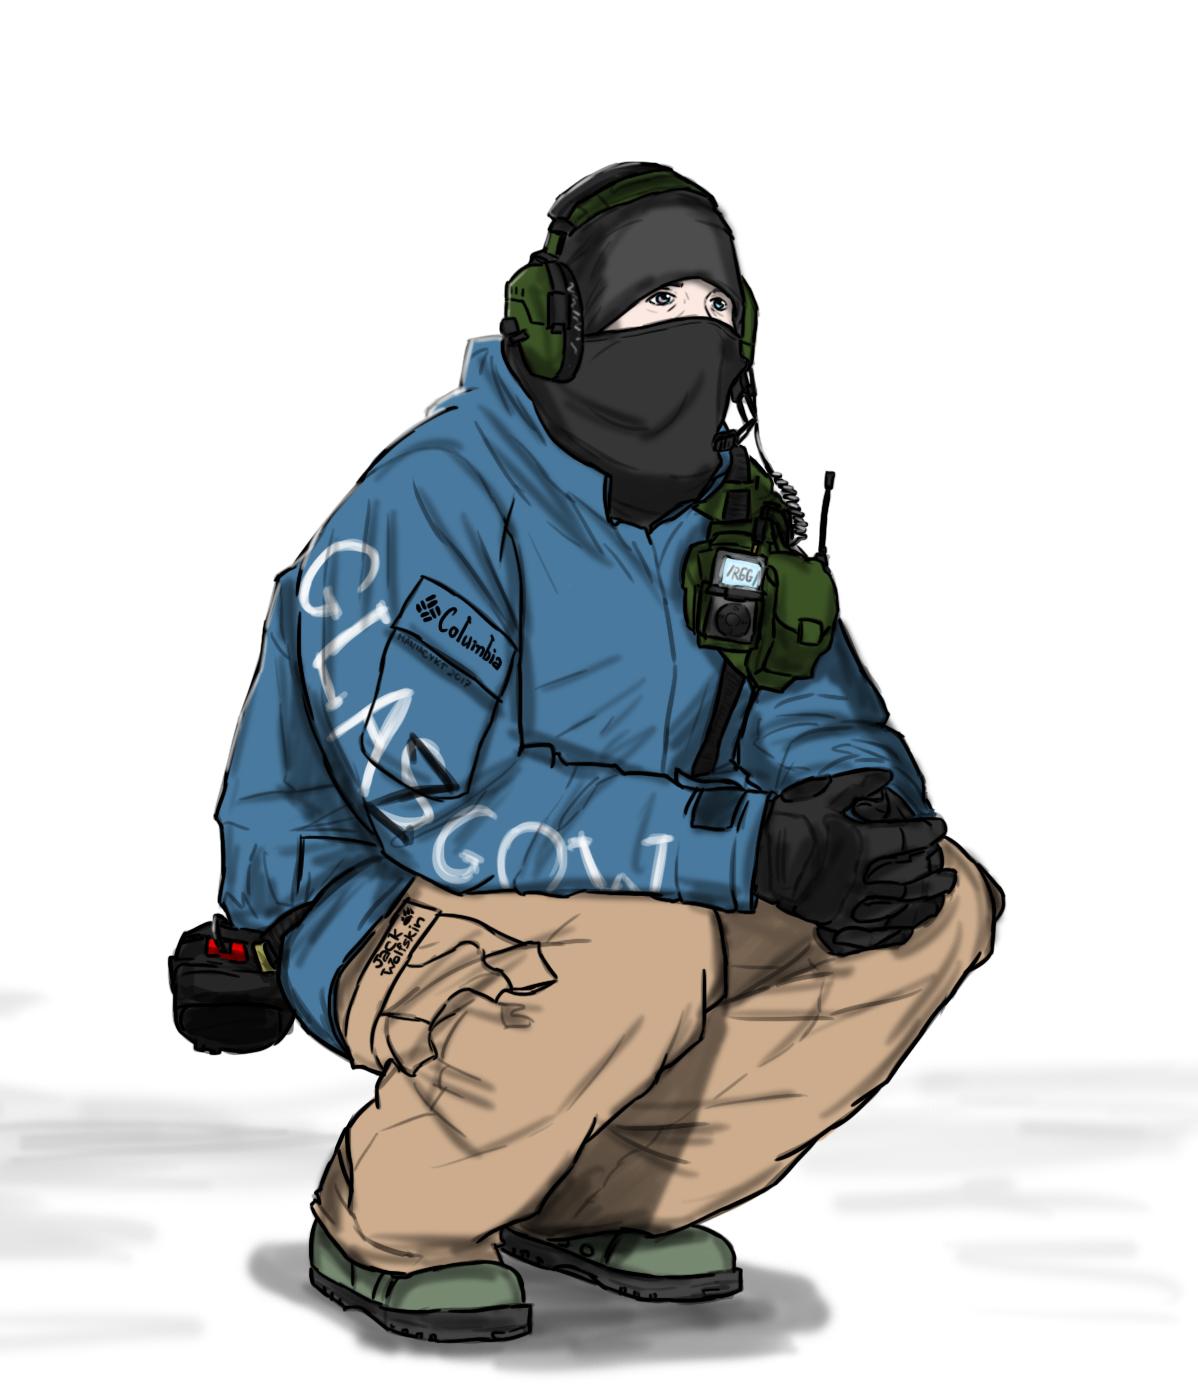 https://orig00.deviantart.net/e321/f/2017/310/6/d/civilian_glaz_by_maniac_kagesenshi-dbsyhn4.jpg